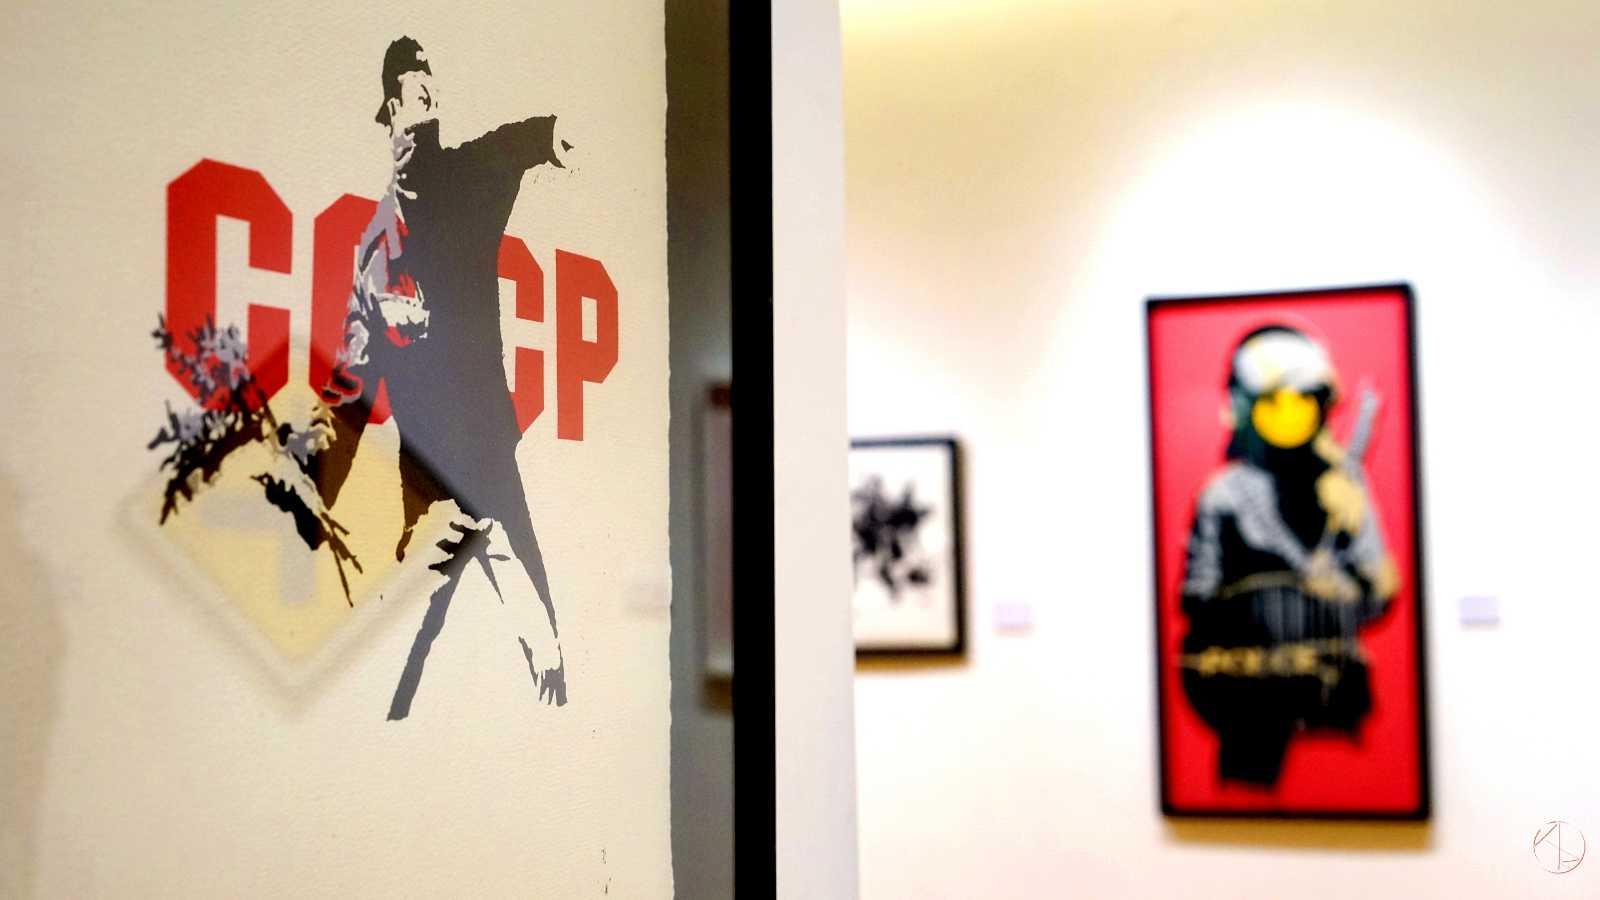 Banksy in Taipei 台北Bellavita班克斯展,蘇維埃擲花者。絲網版畫,2003年作品。